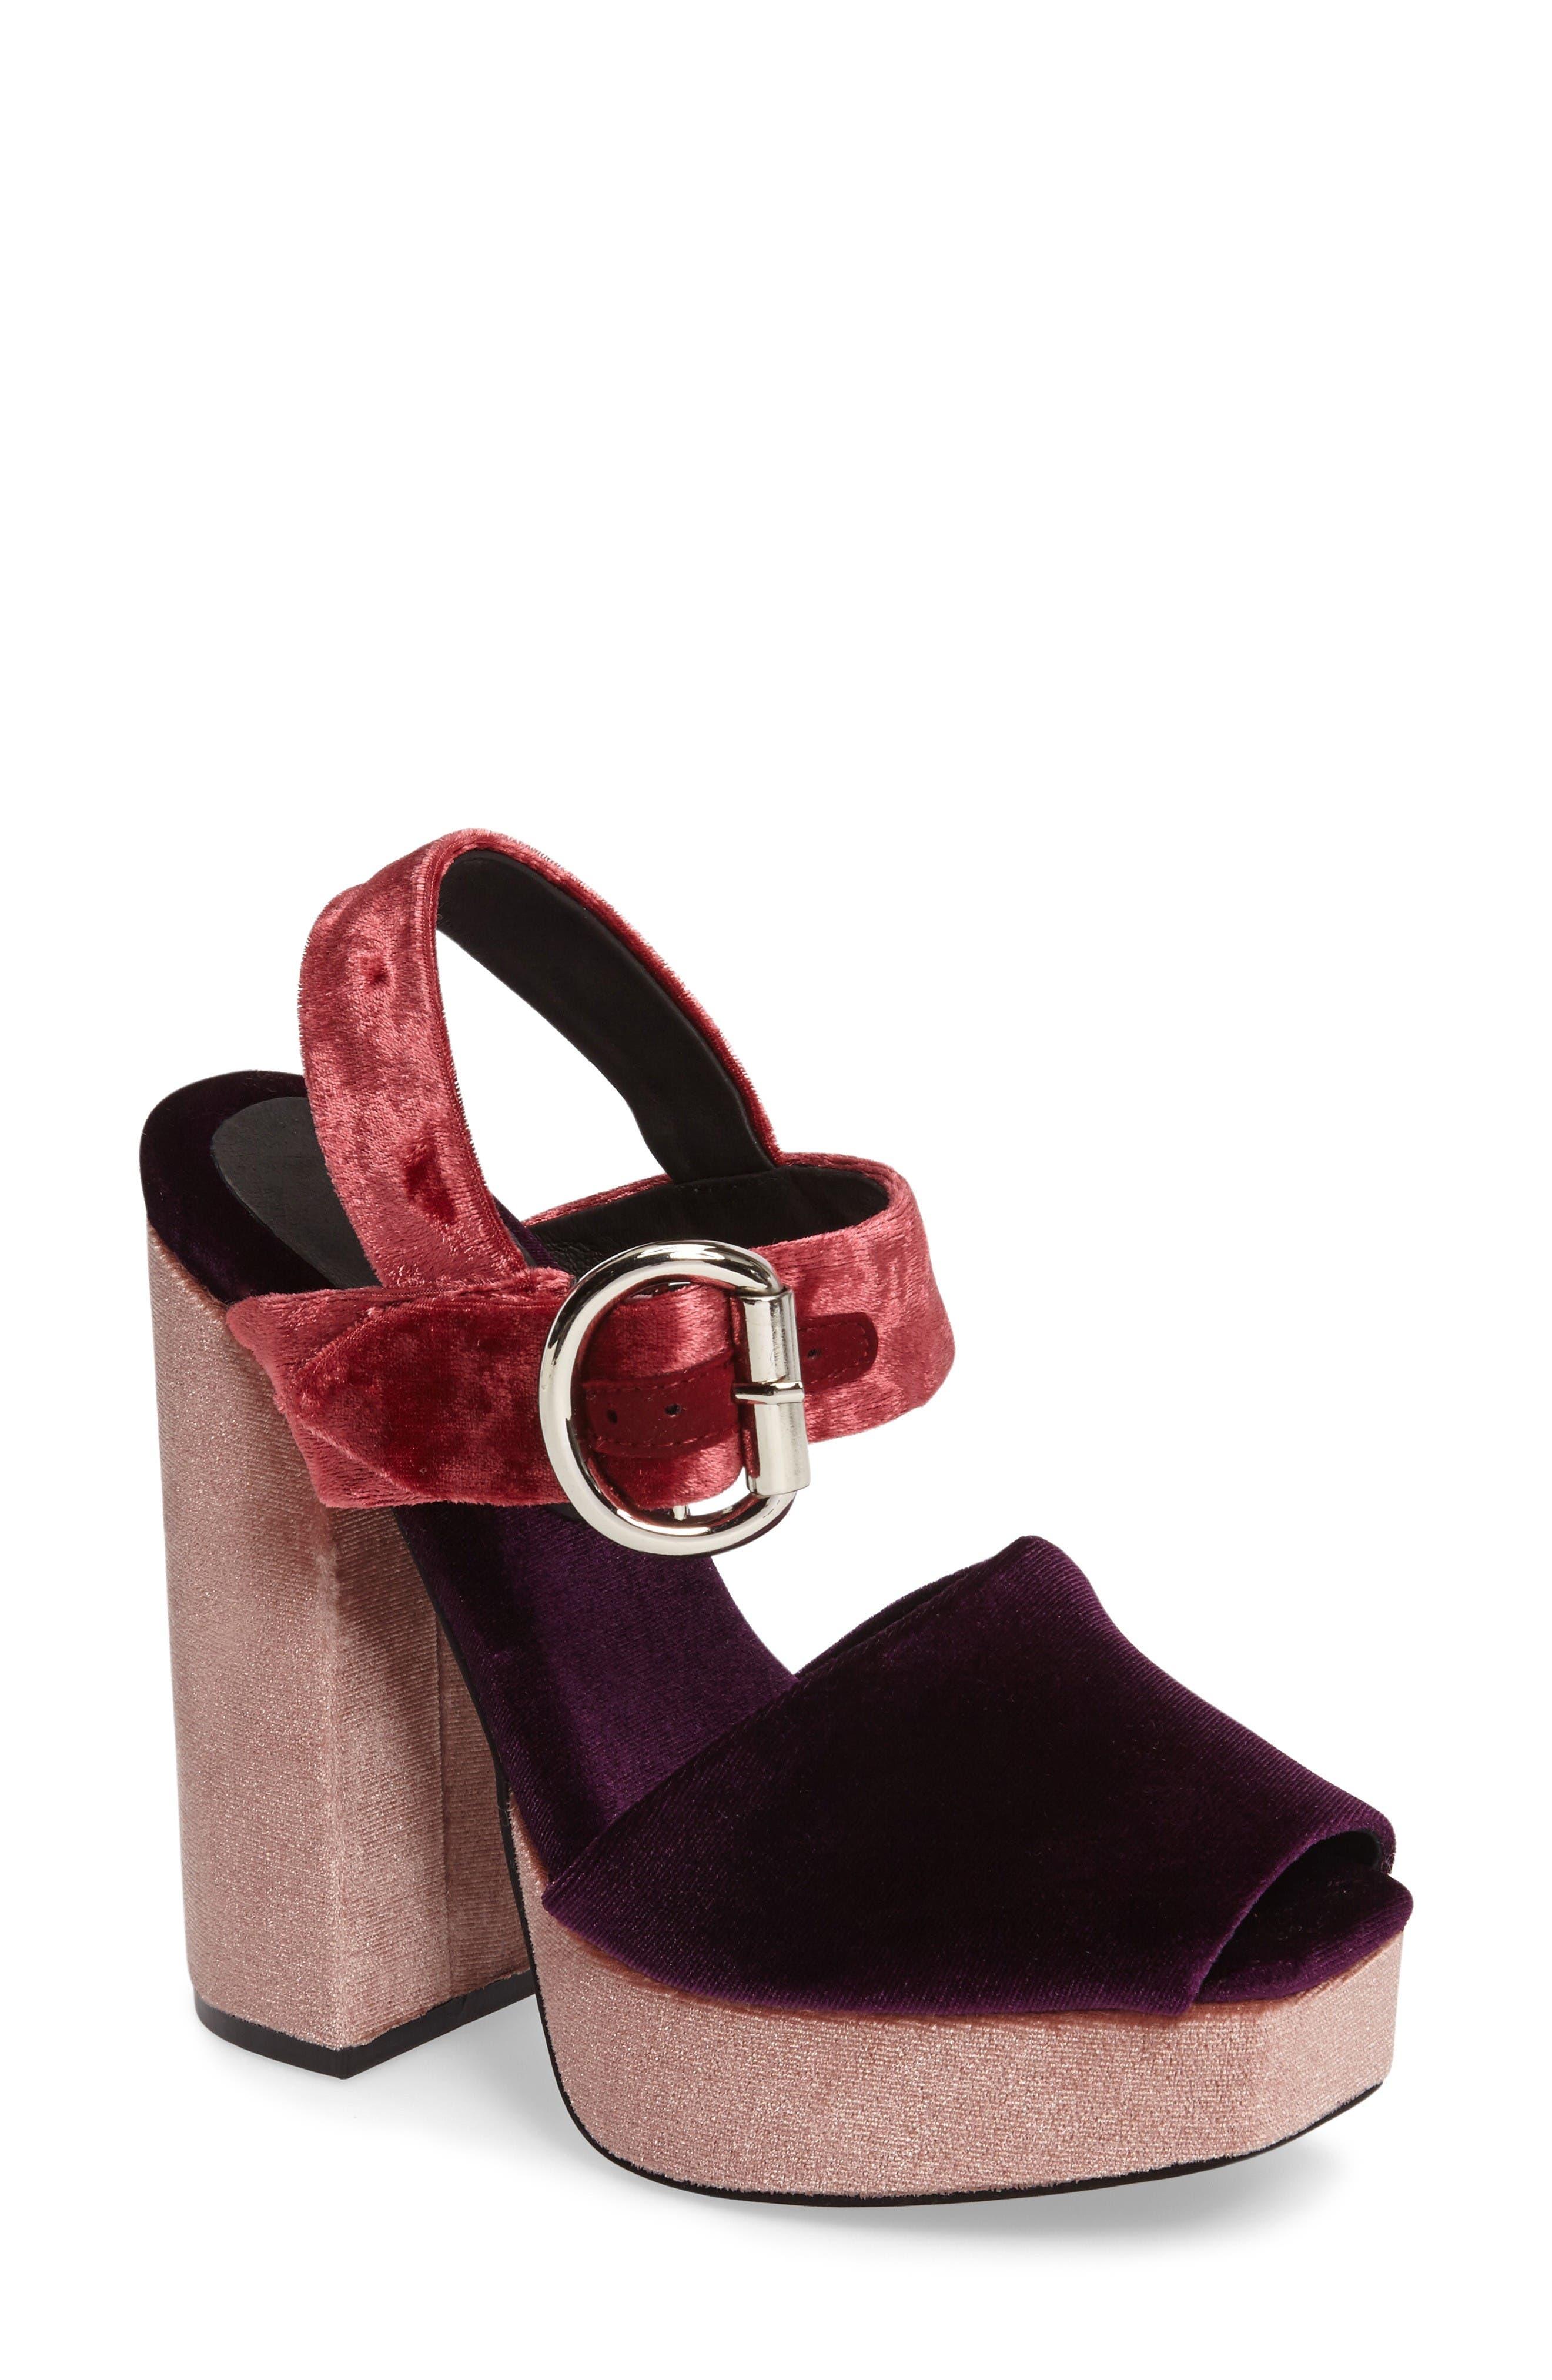 Alternate Image 1 Selected - Jeffrey Campbell Mitra Platform Sandal (Women)